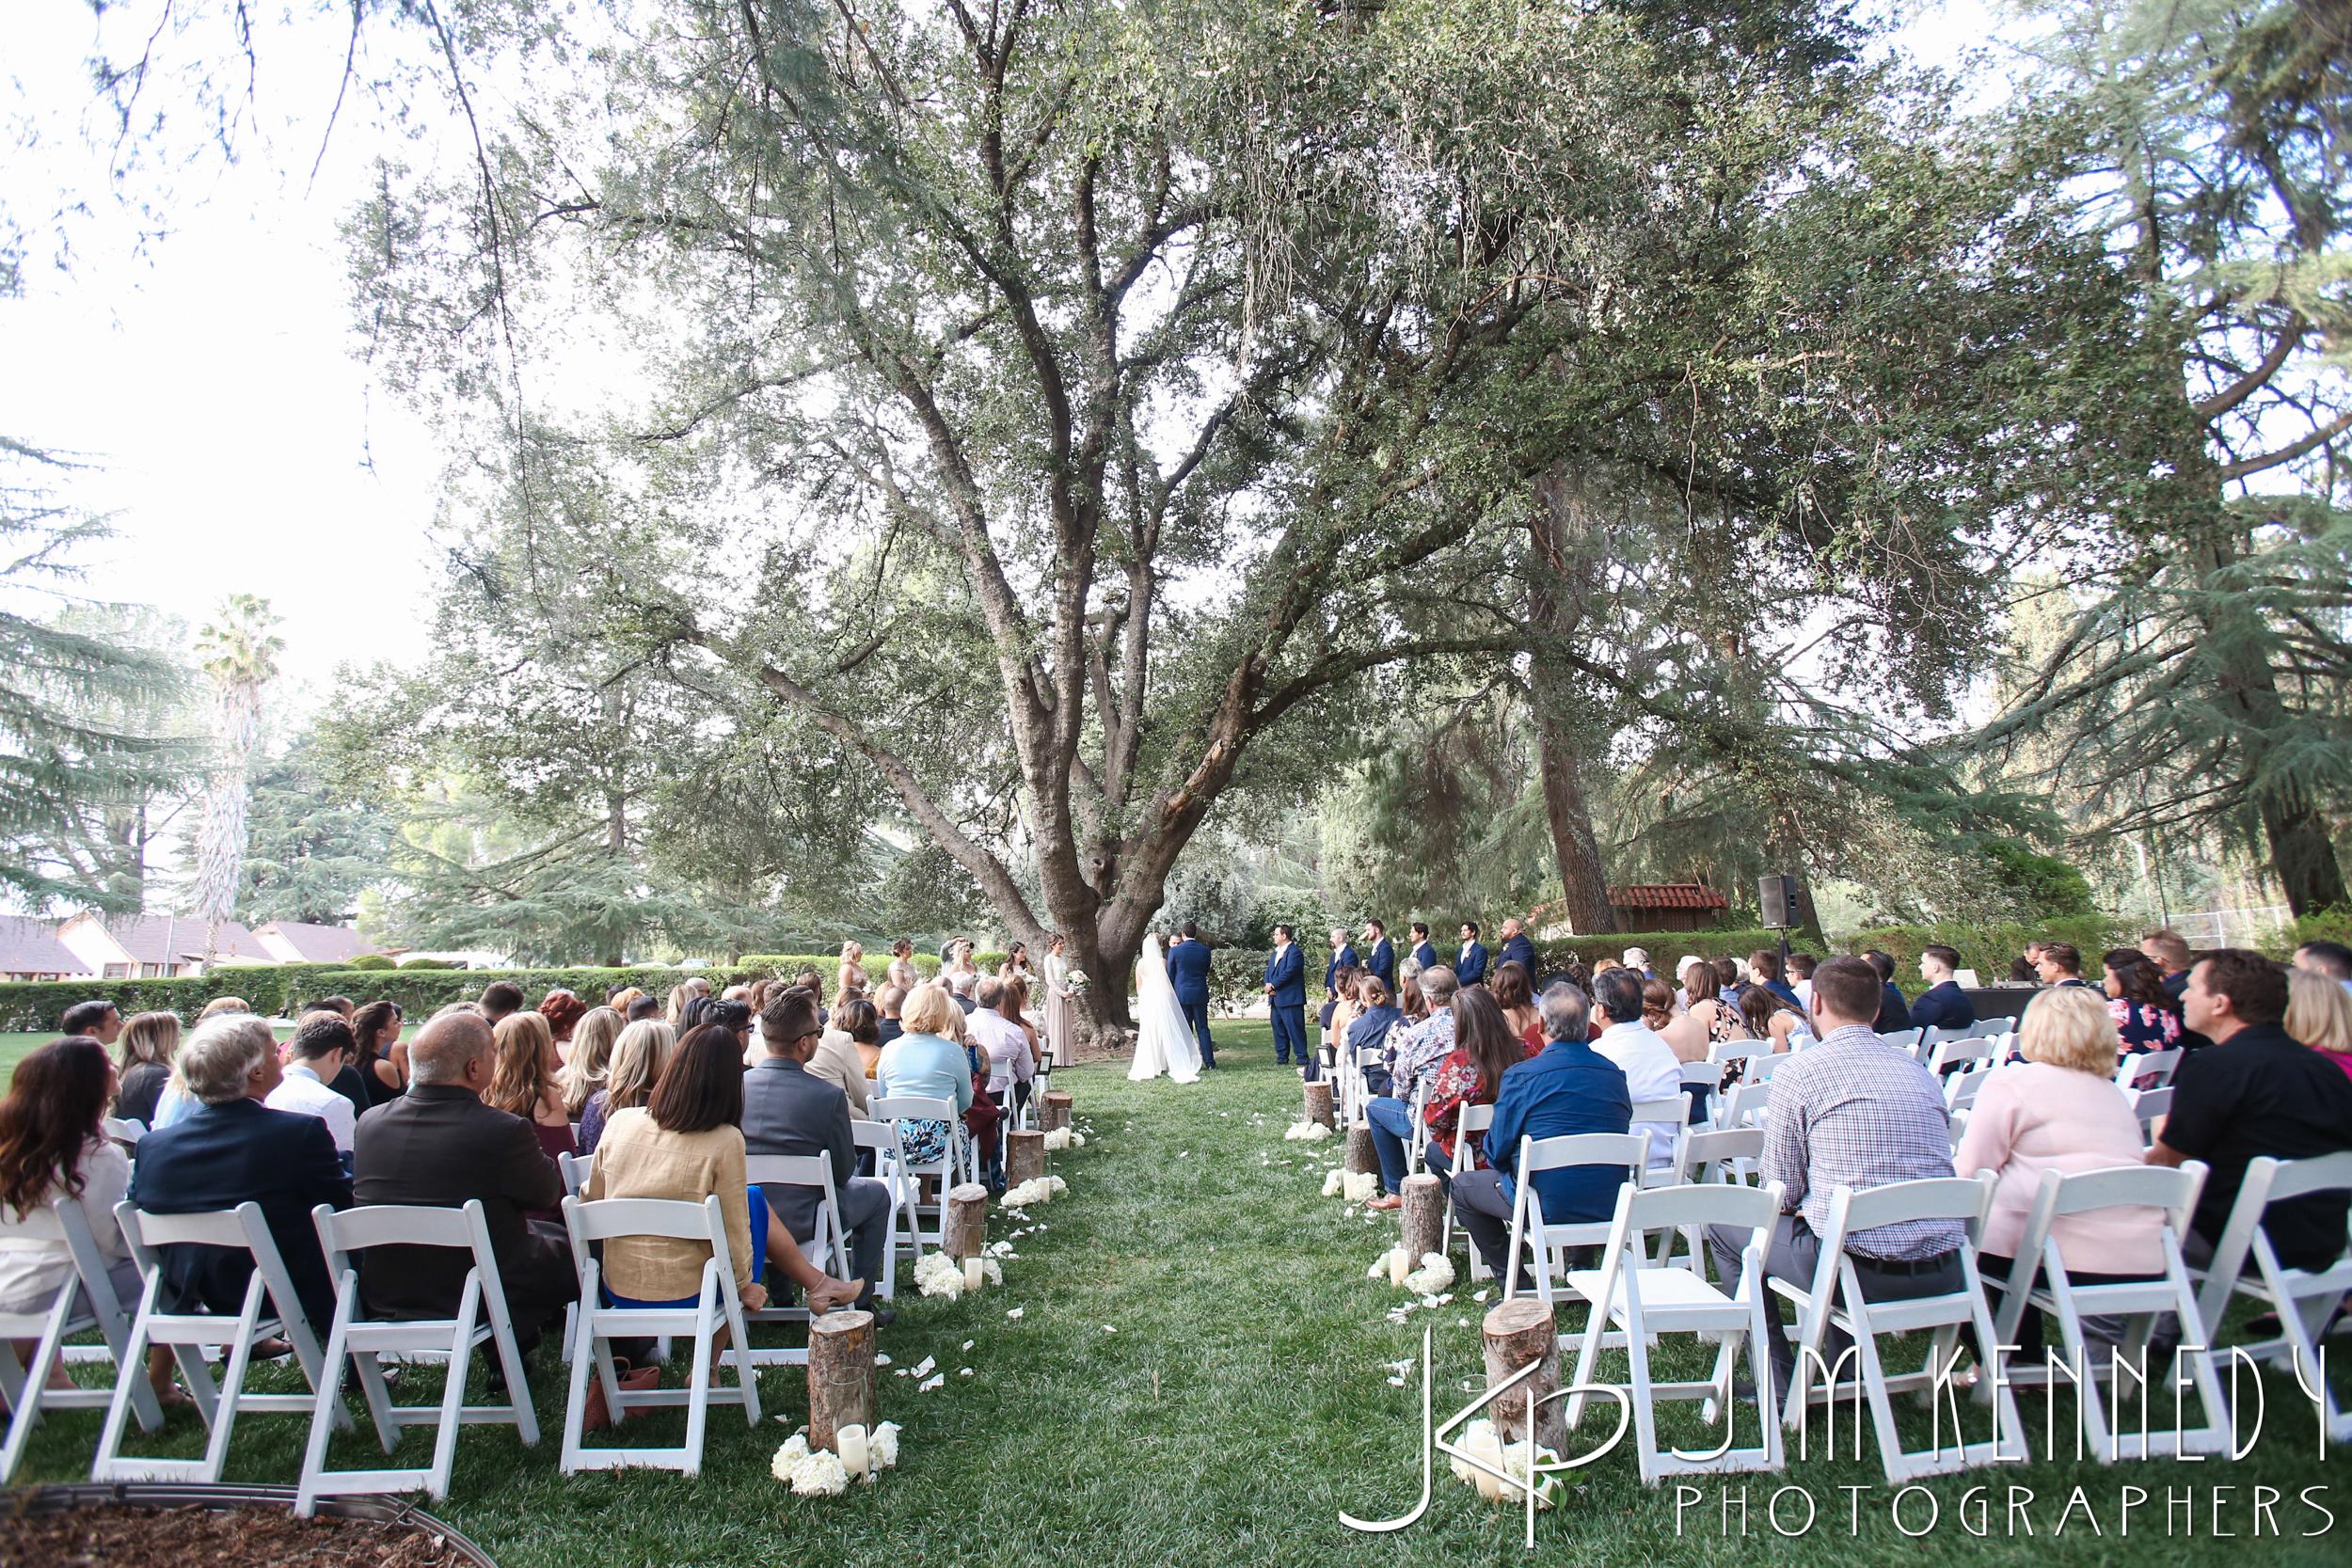 jim_kennedy_photographers_highland_springs_wedding_caitlyn_0110.jpg